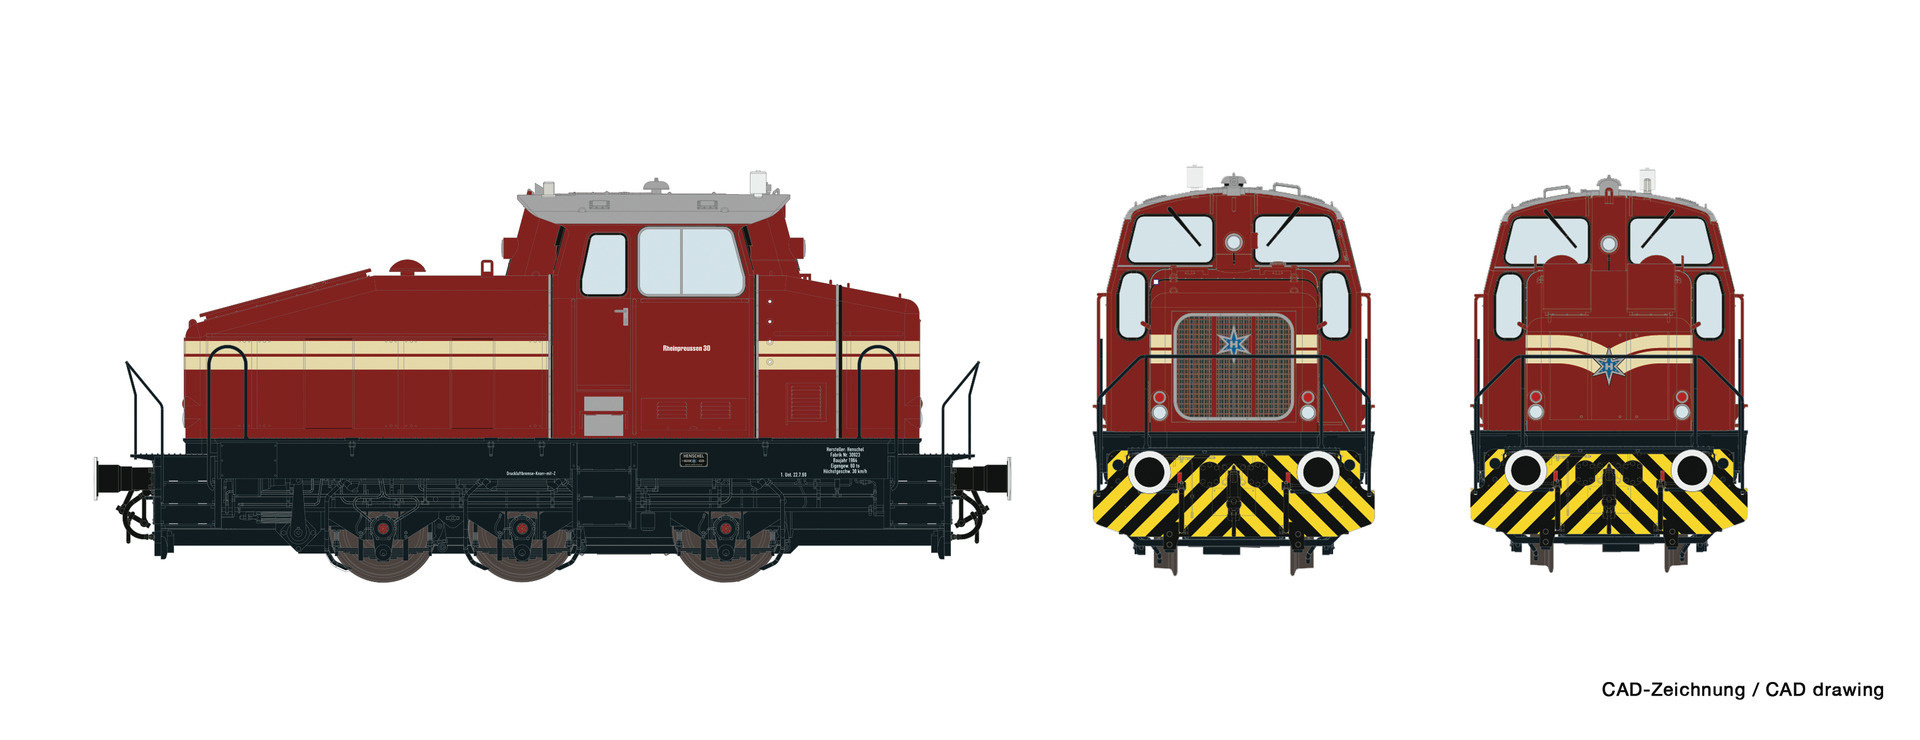 72178 Diesellok DHG 500 Rheinp.-1